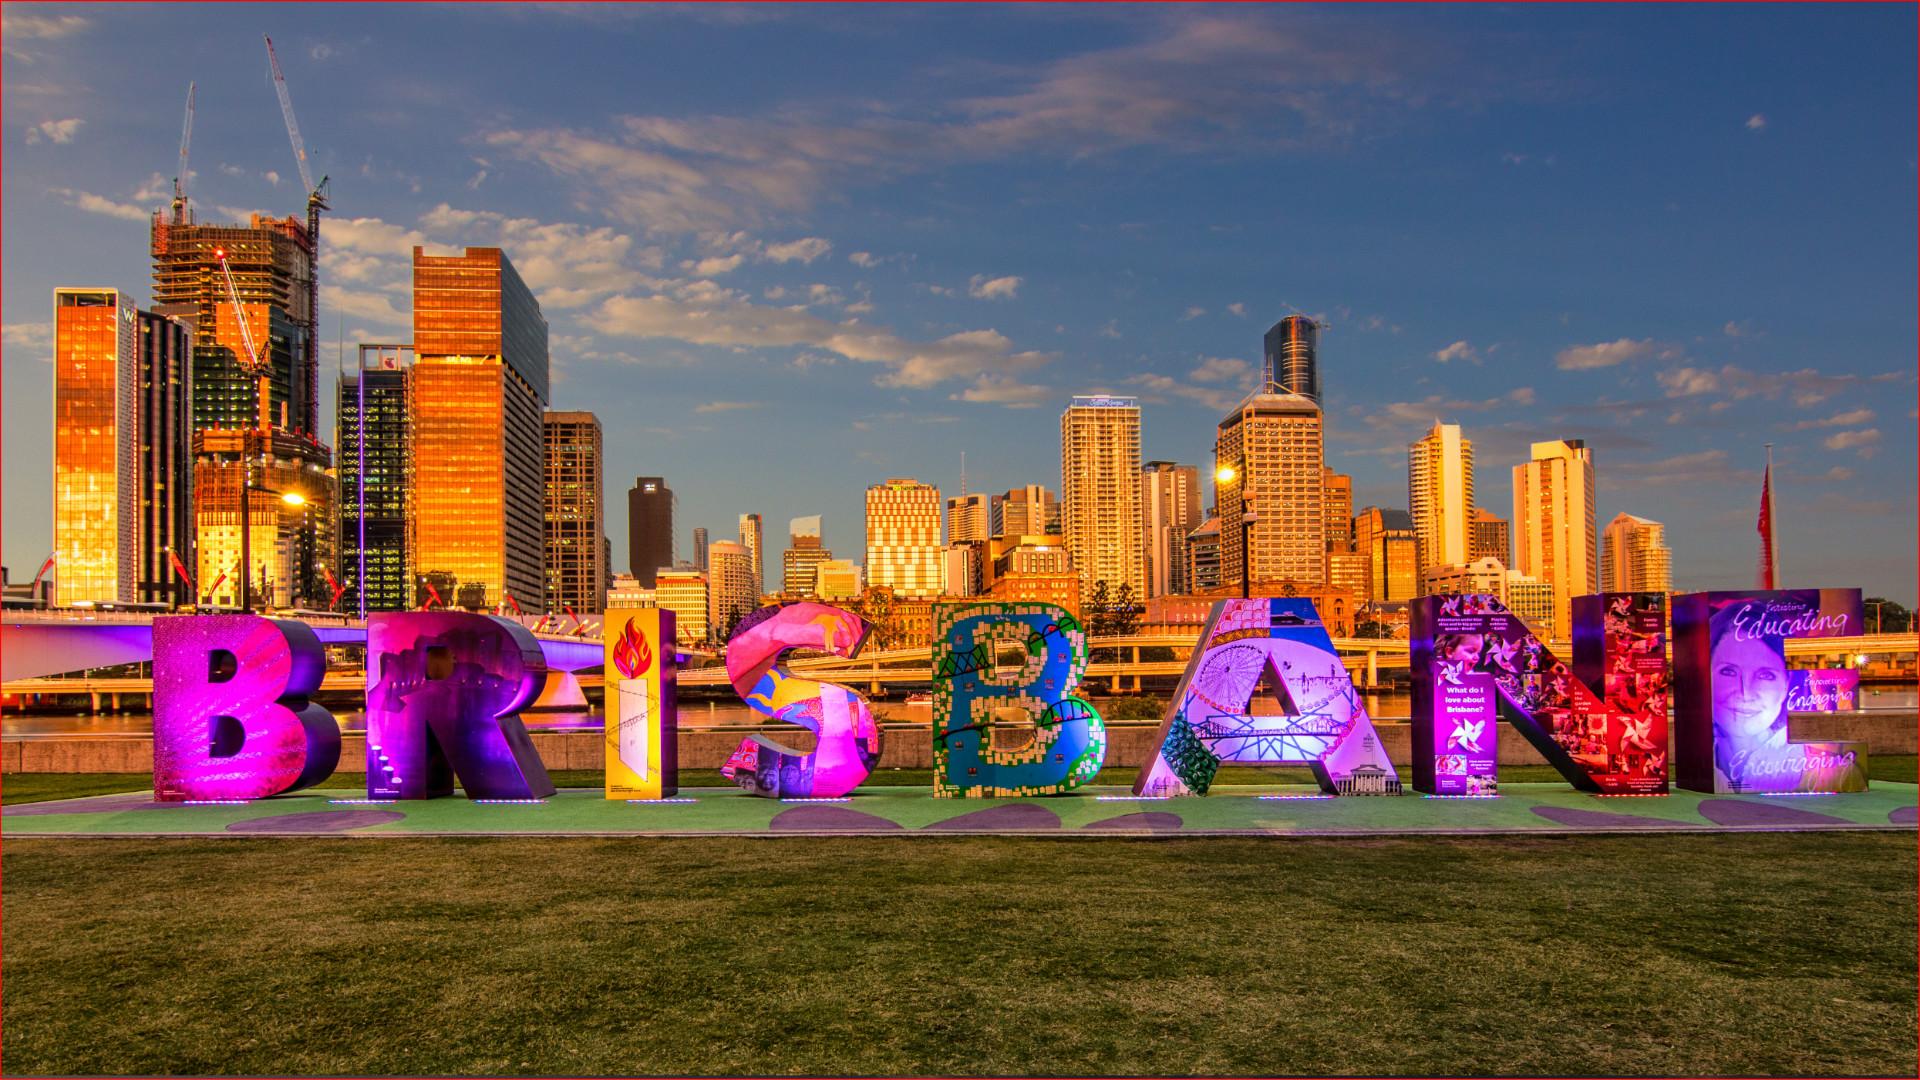 My Brisbane_Sign of a City_Rod Nancarrow_Agr_Merit&MostAptTitle